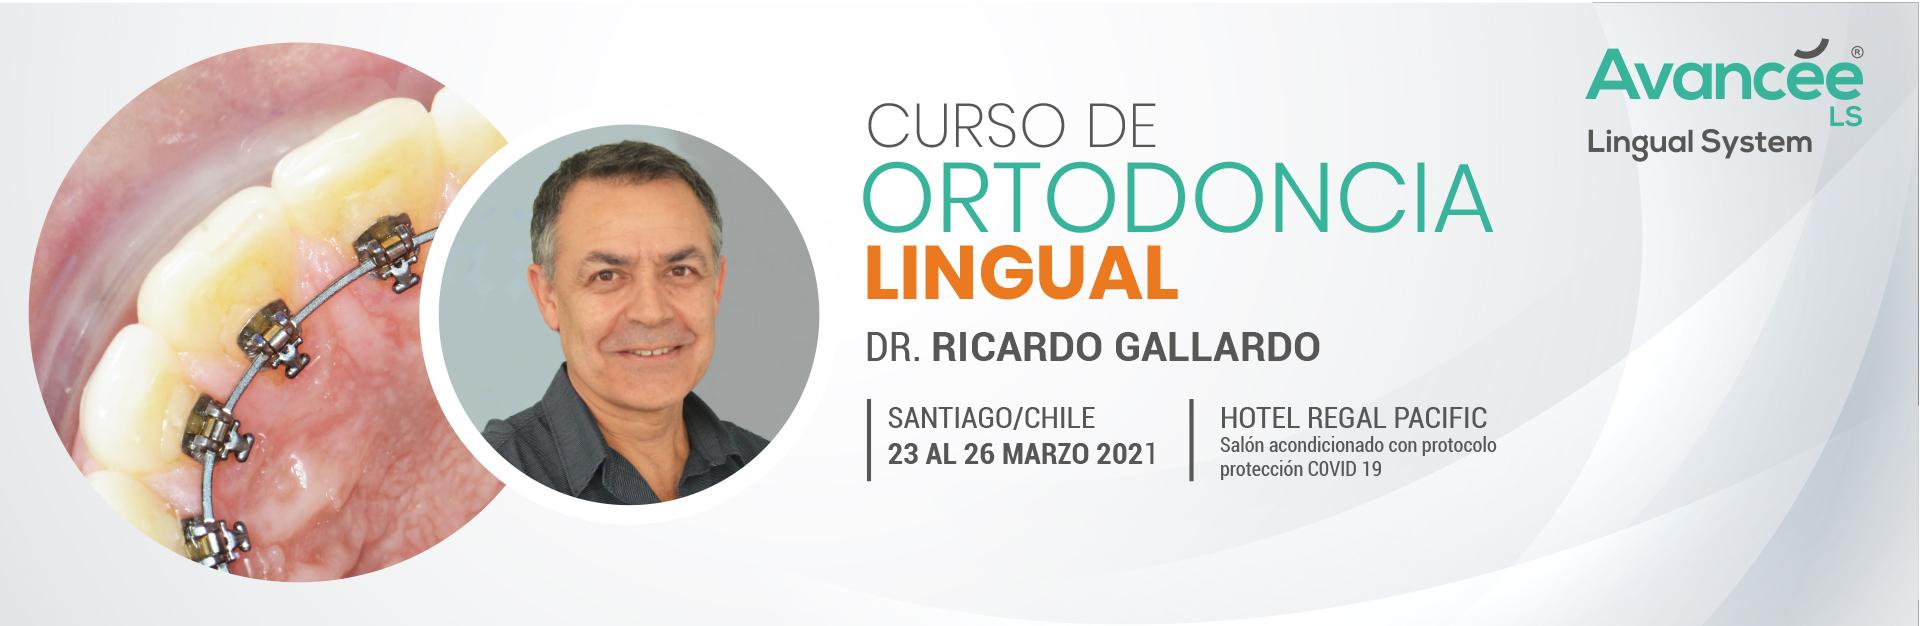 Curso Ortodoncia Lingual 2021